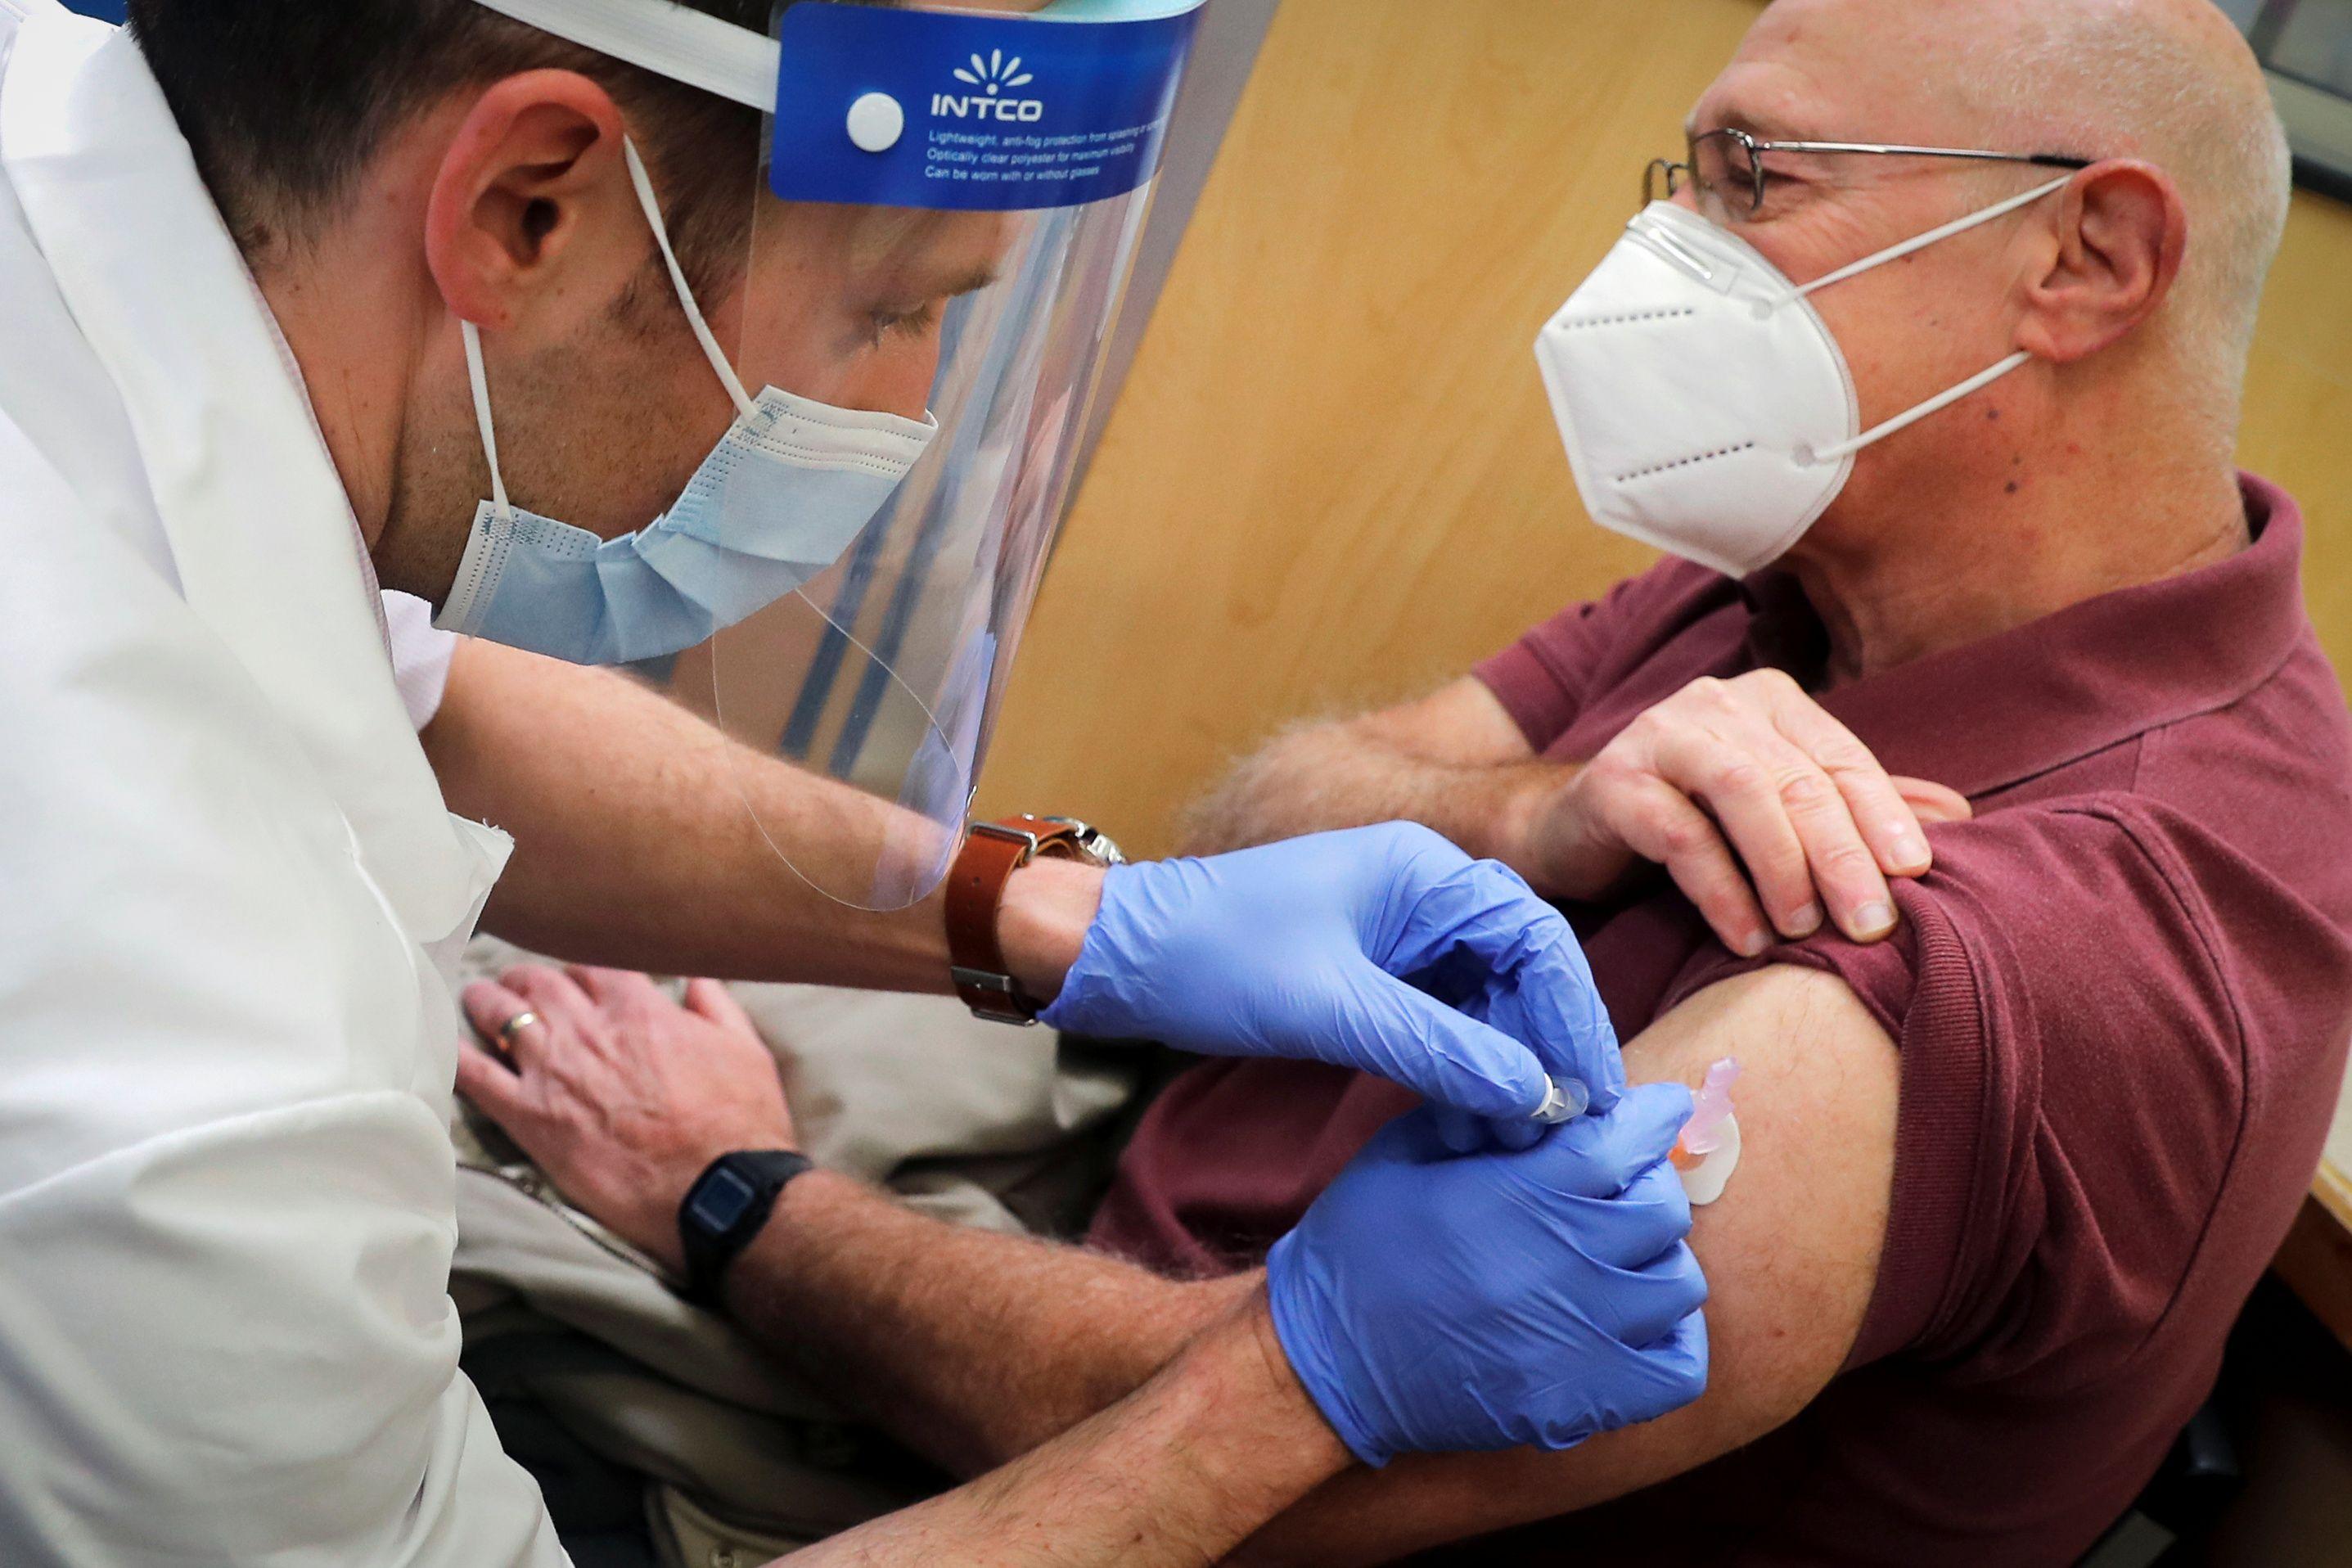 Jeff Stone de West Haven, Connecticut, recibe la vacuna contra el coronavirus - REUTERS/Mike Segar